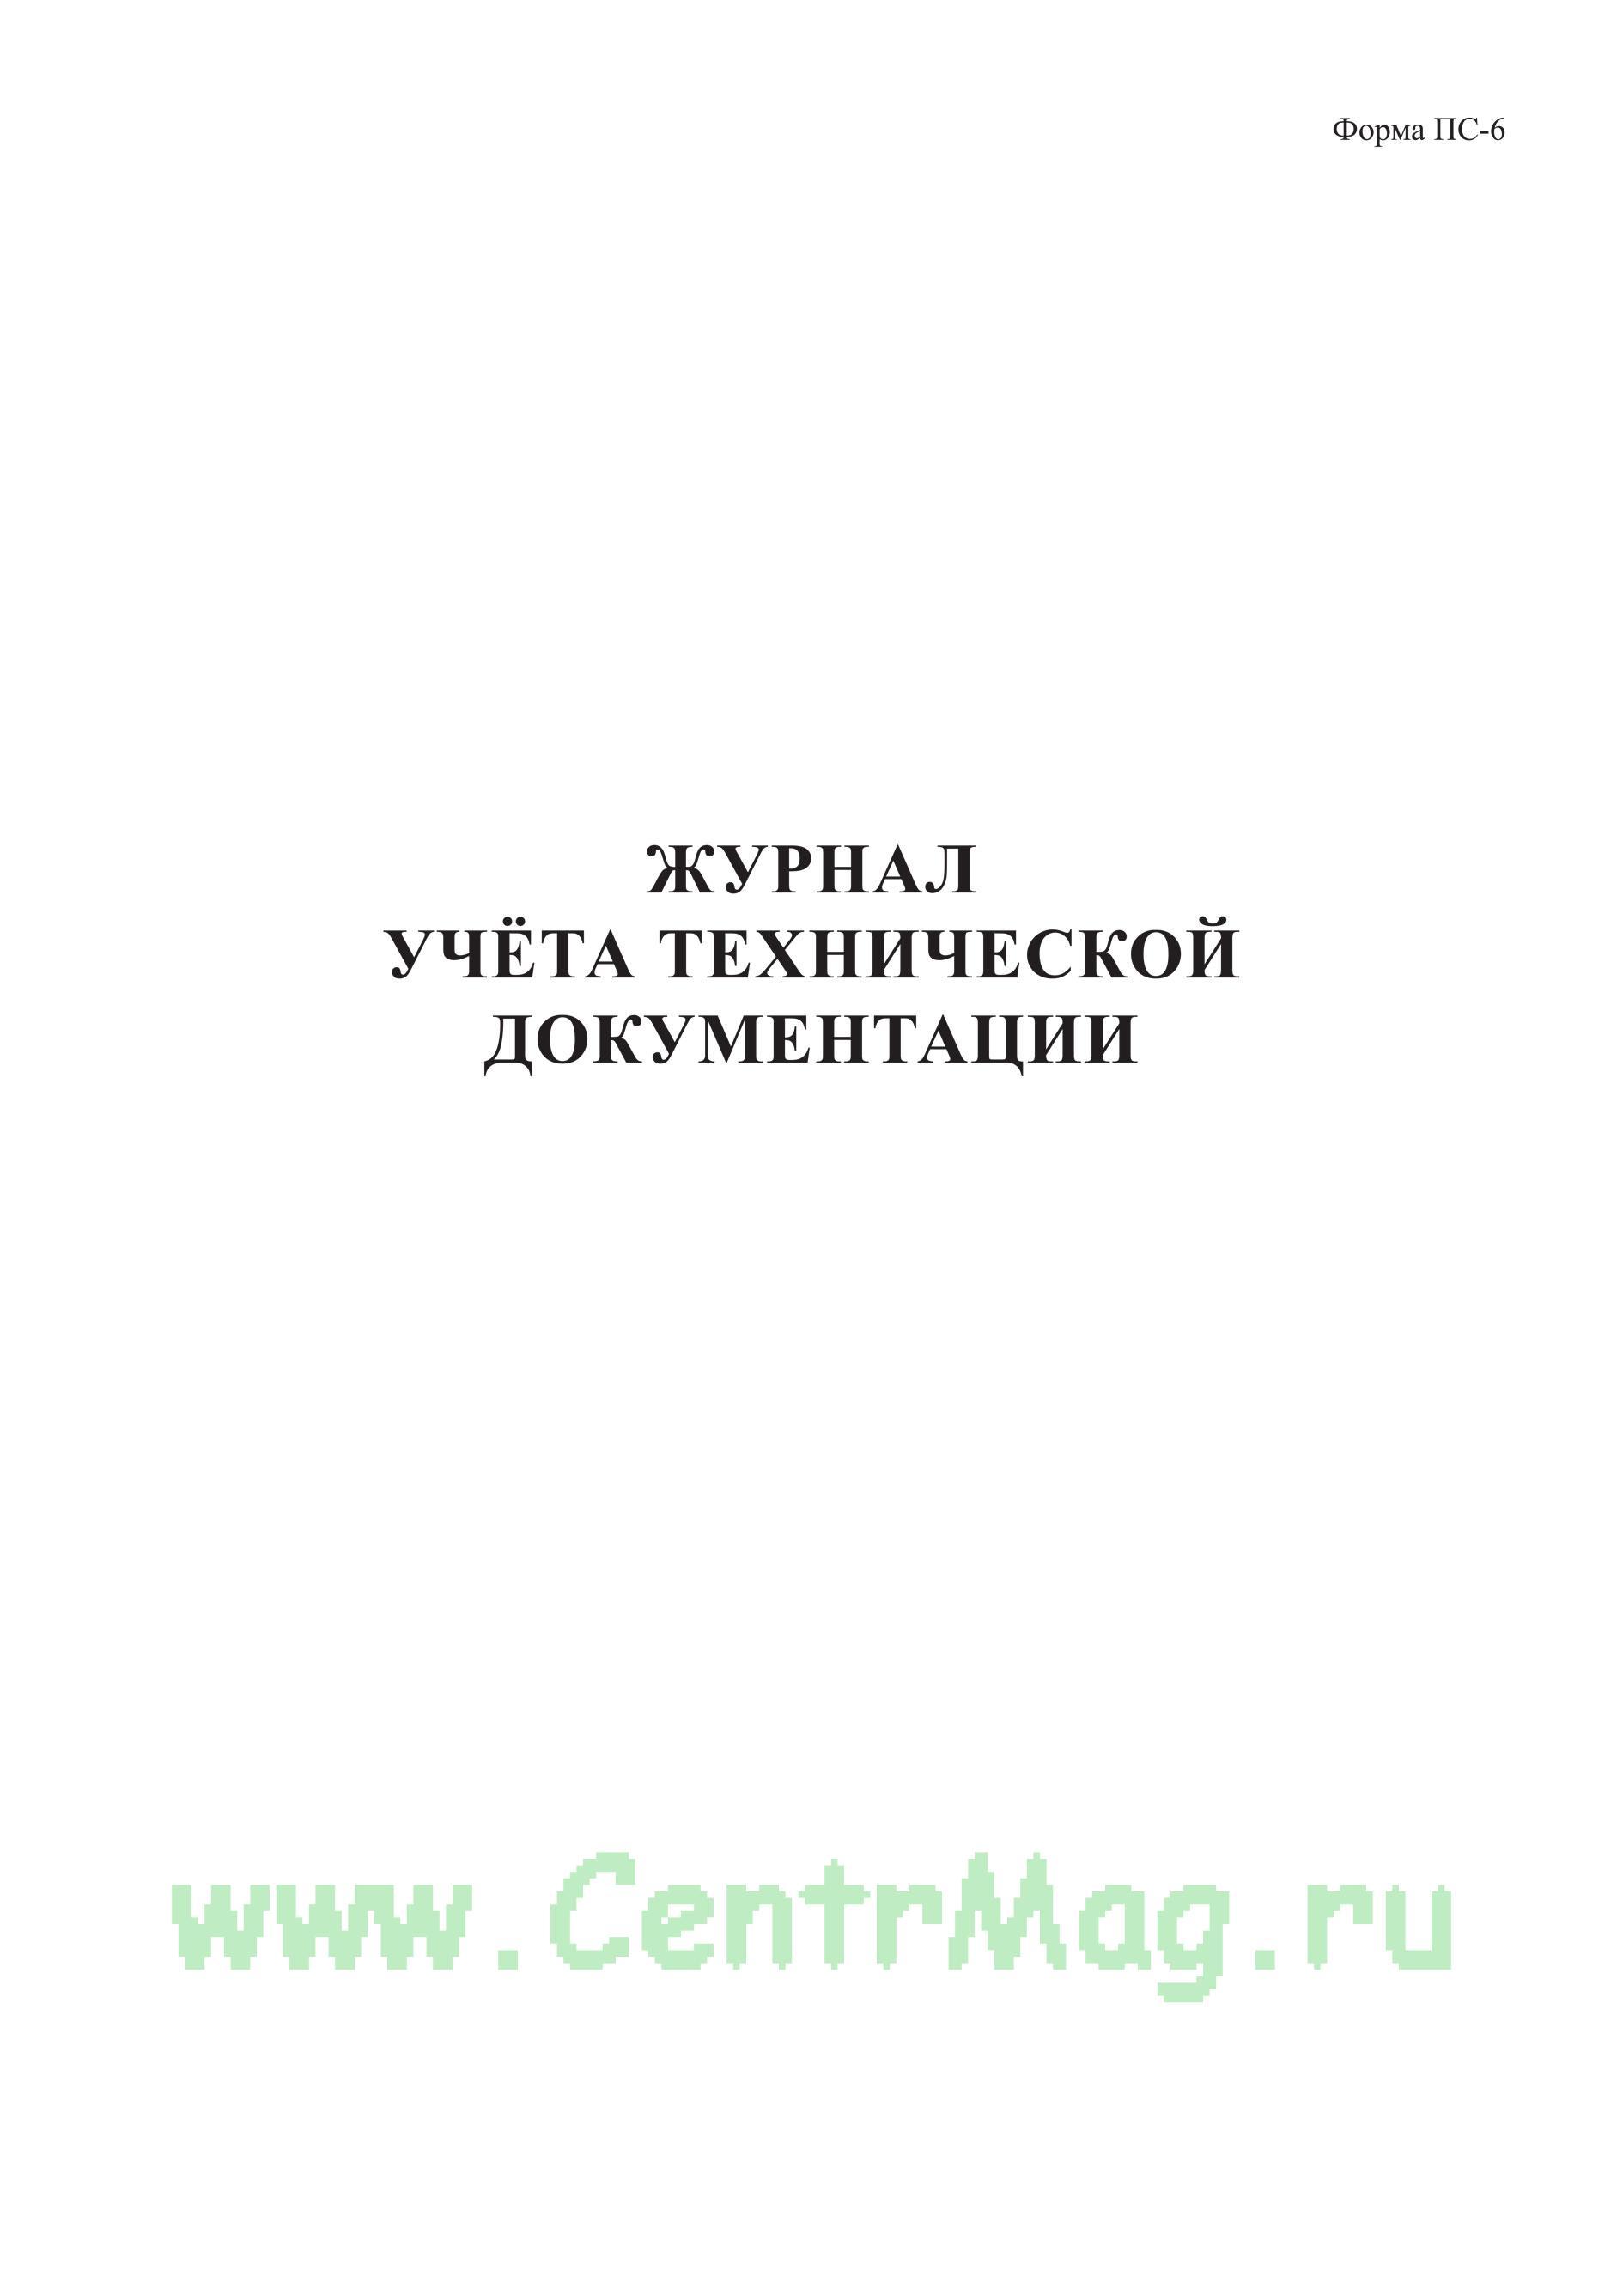 Журнал учета технической документации. форма ПС-6